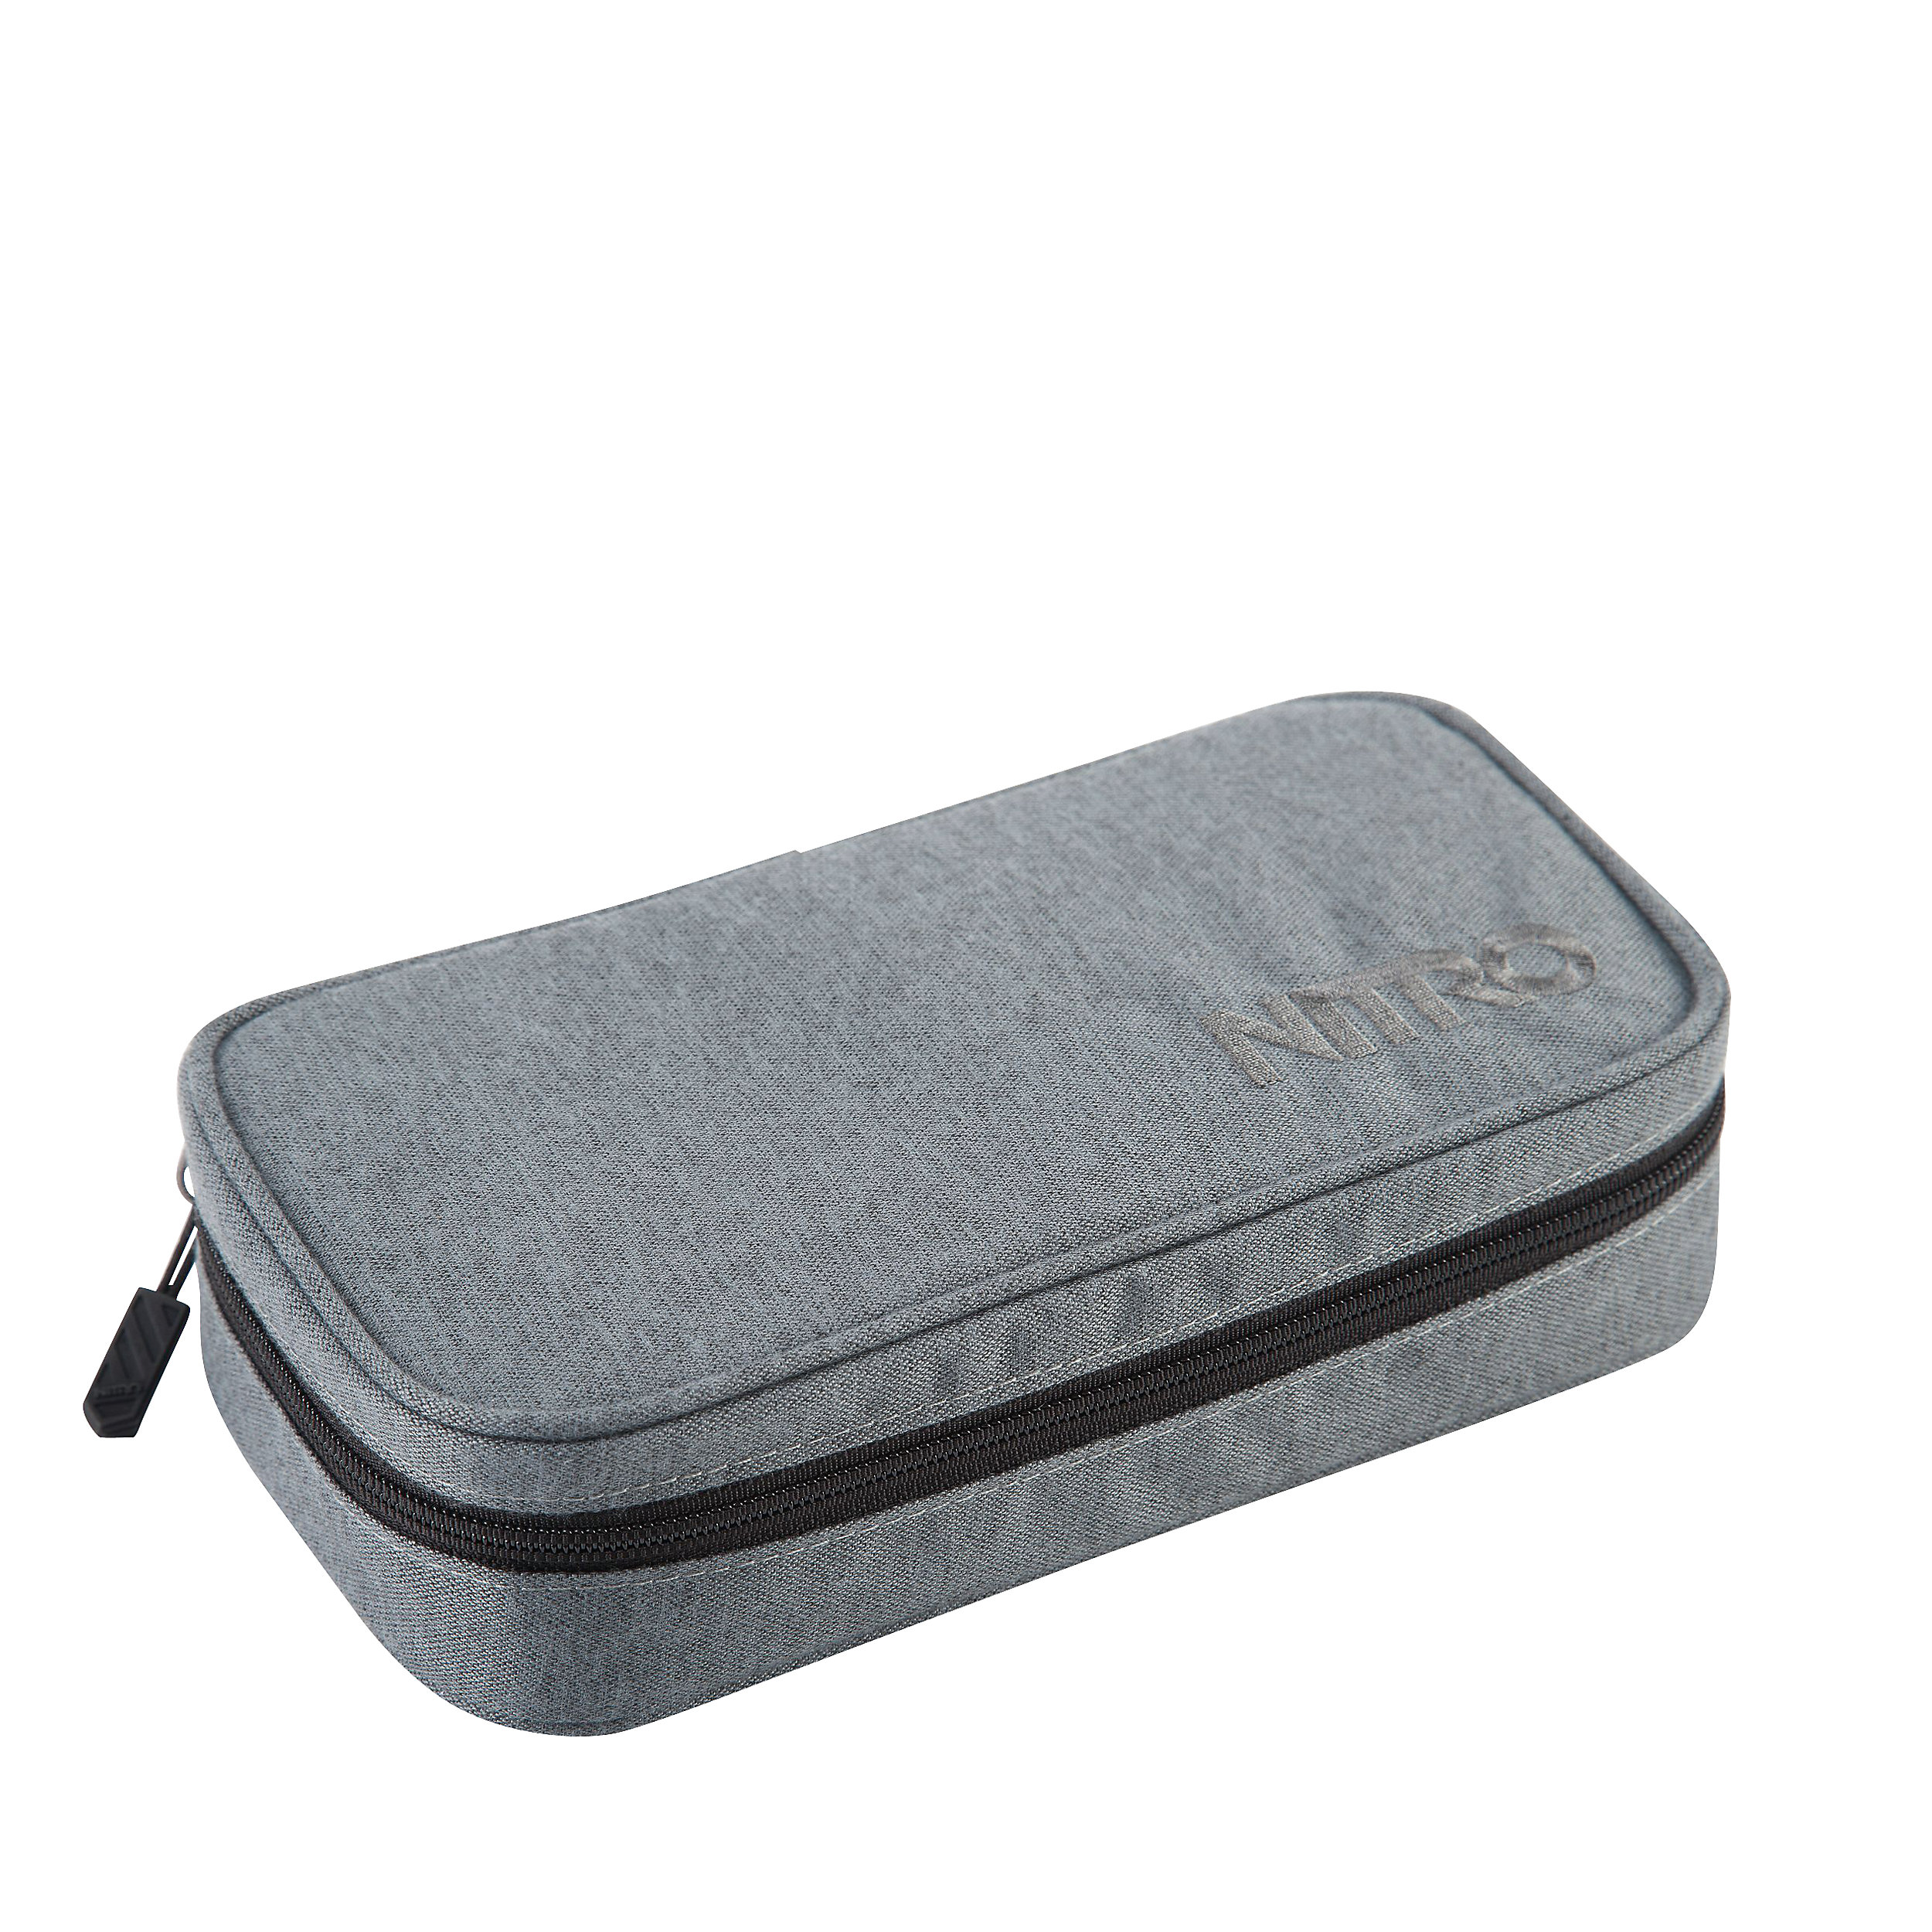 Schlamperbox XL Daypack Collection